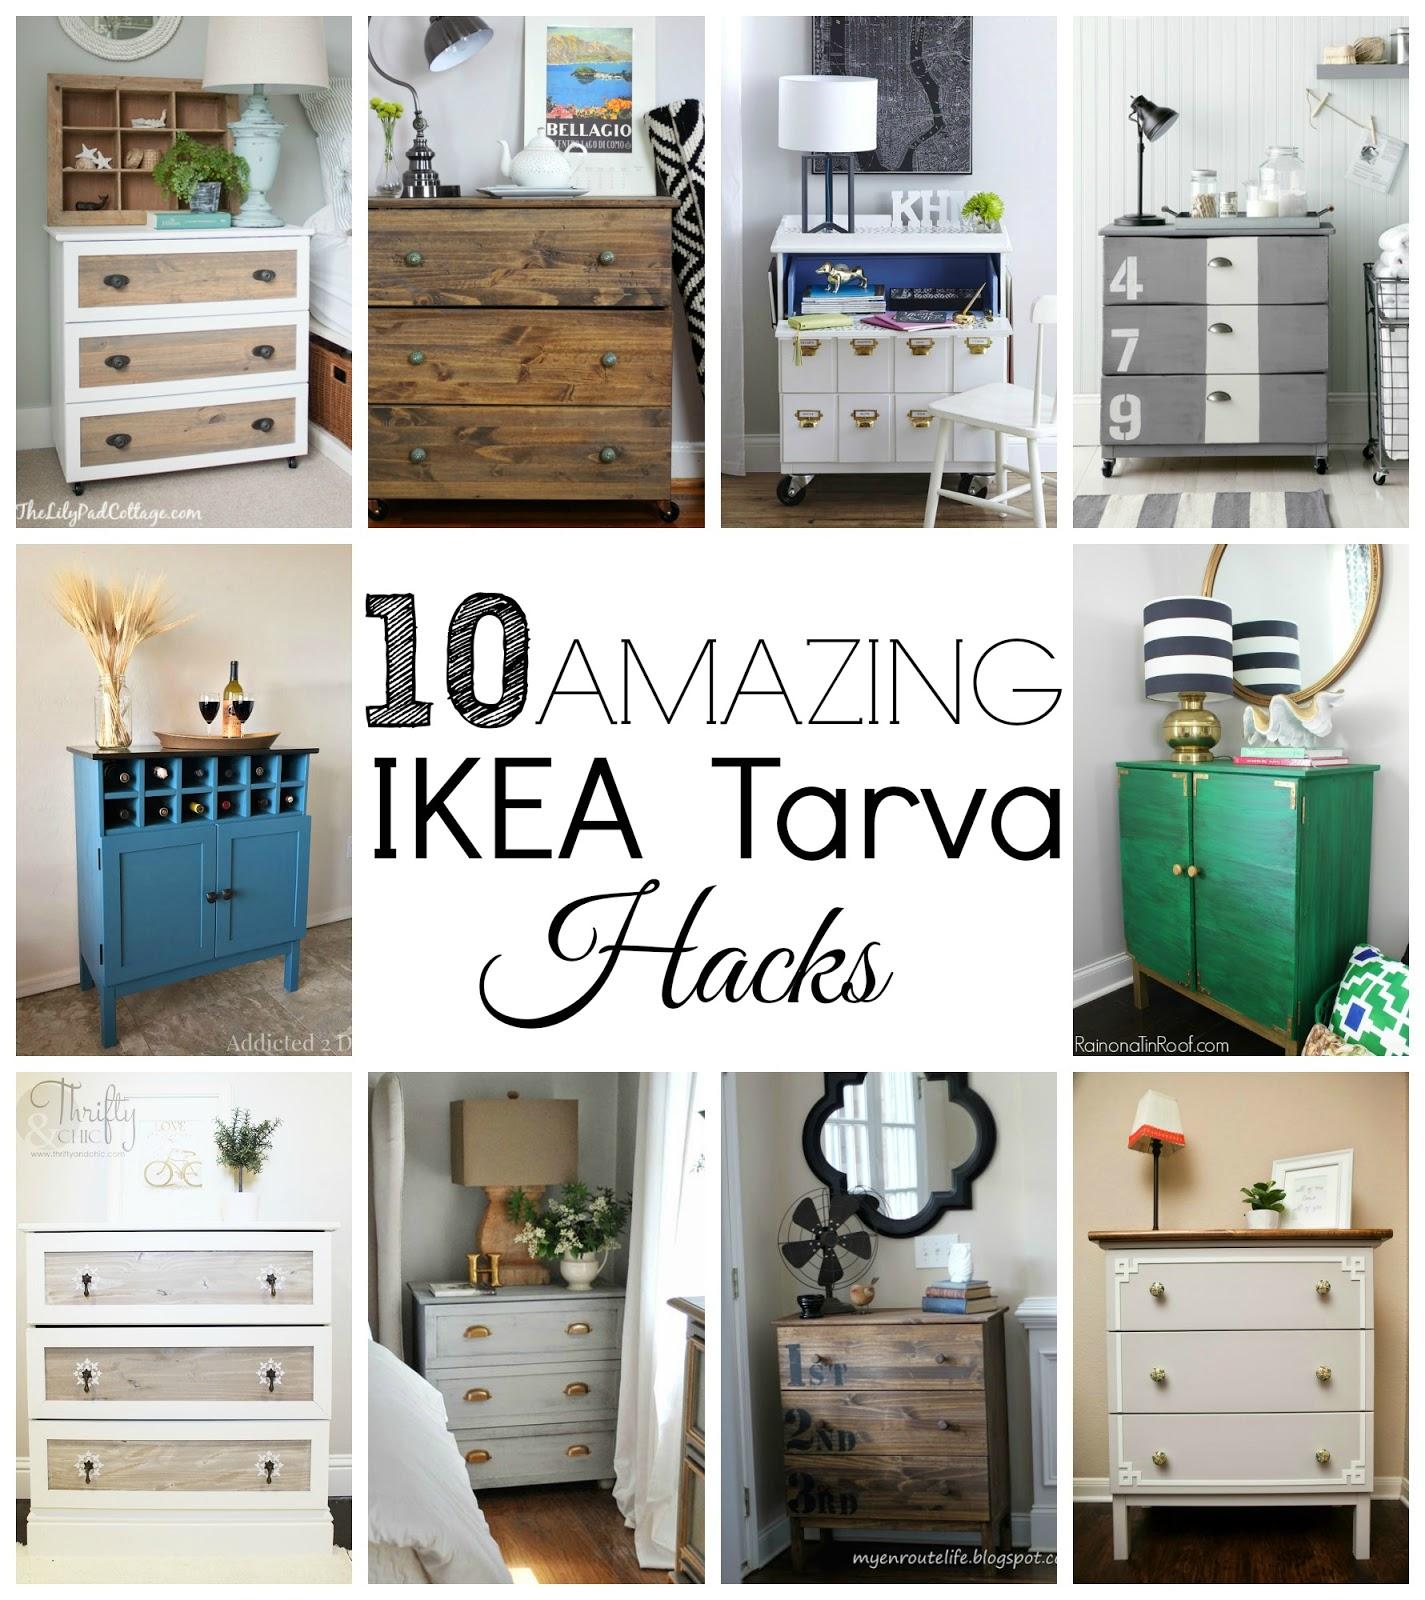 ikea furniture hacks. 10 Amazing IKEA Tarva Hacks Ikea Furniture U